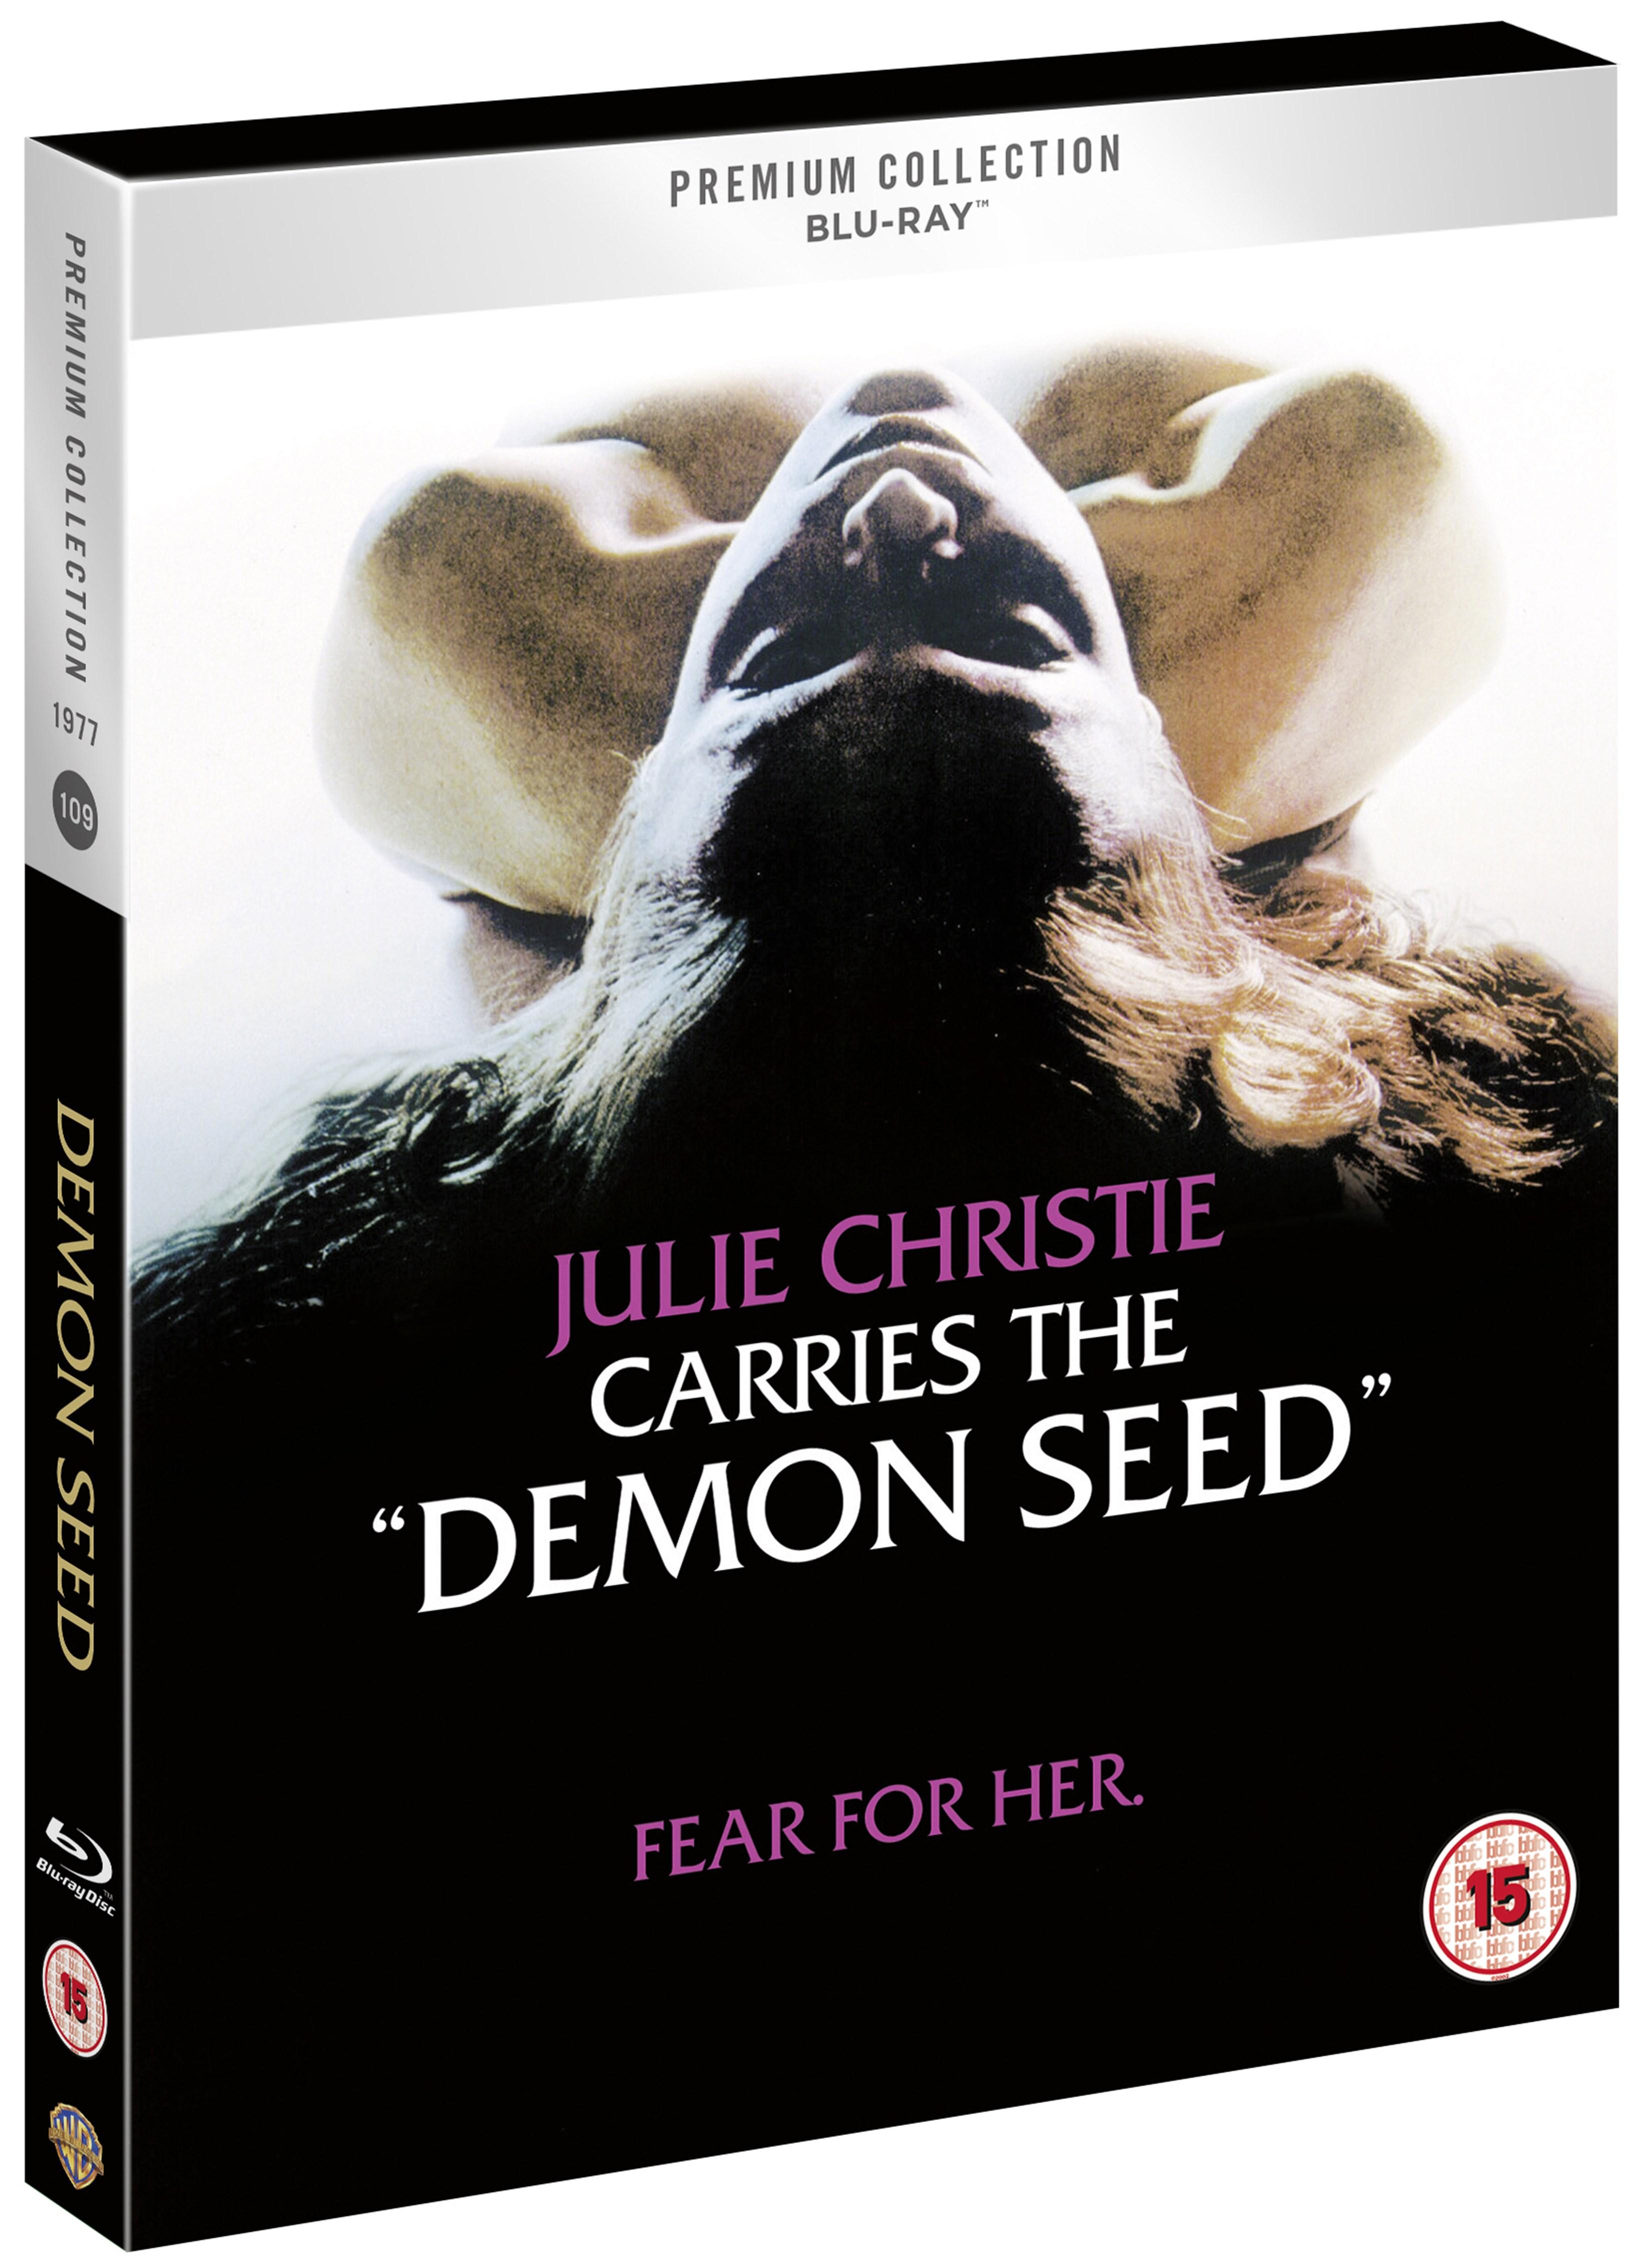 Demon Seed (hmv Exclusive) - The Premium Collection - 2